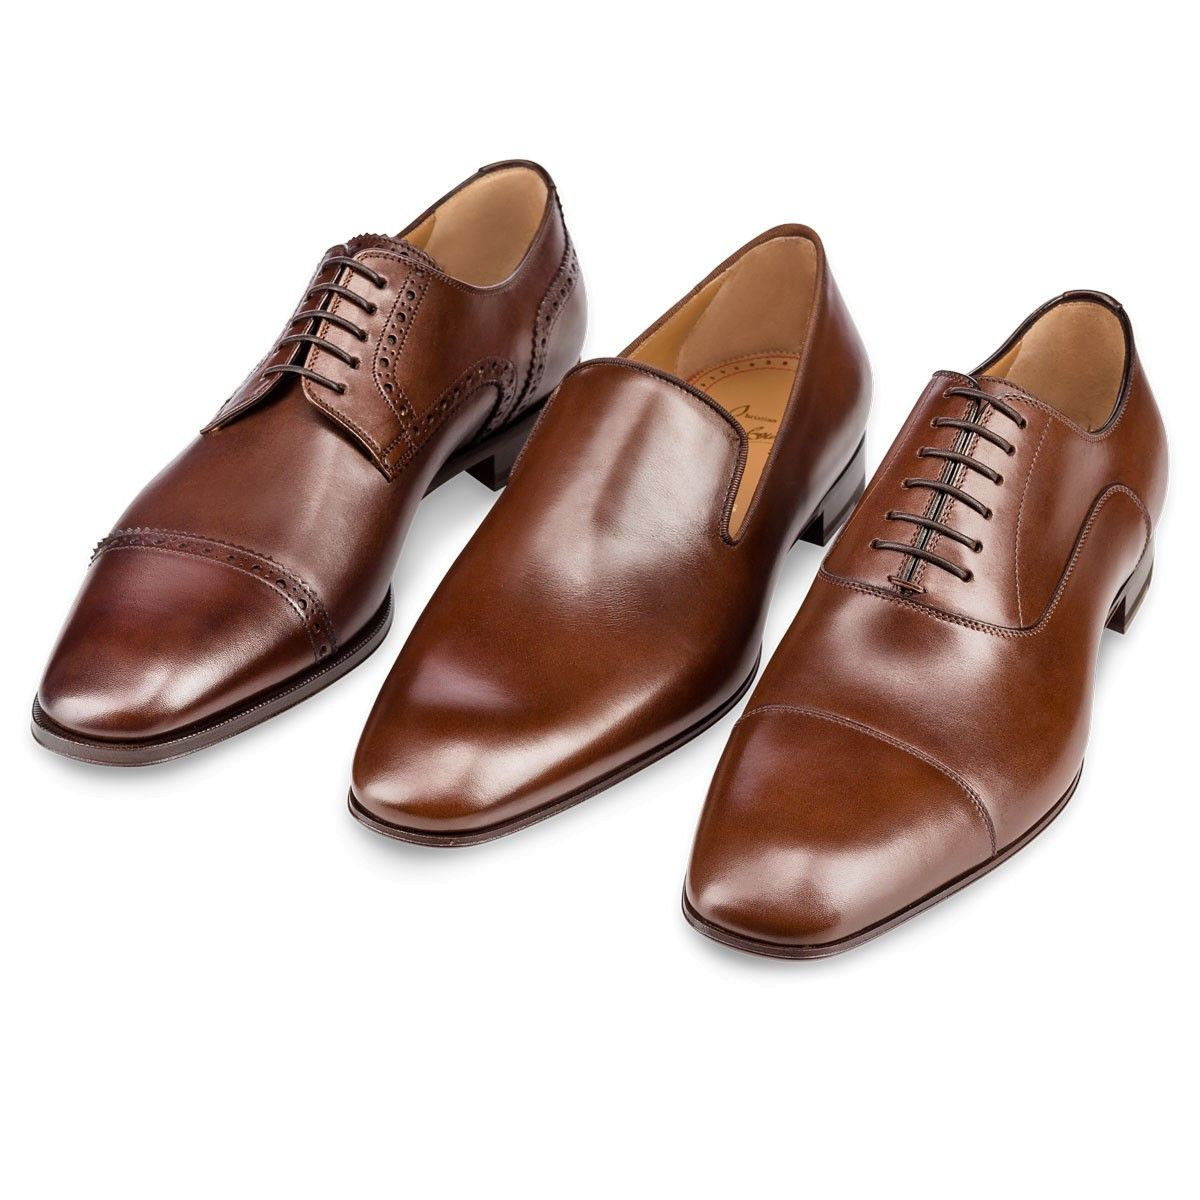 6b54fff7f45 Dandelion Flat Havane Leather - Men Shoes - Christian Louboutin ...